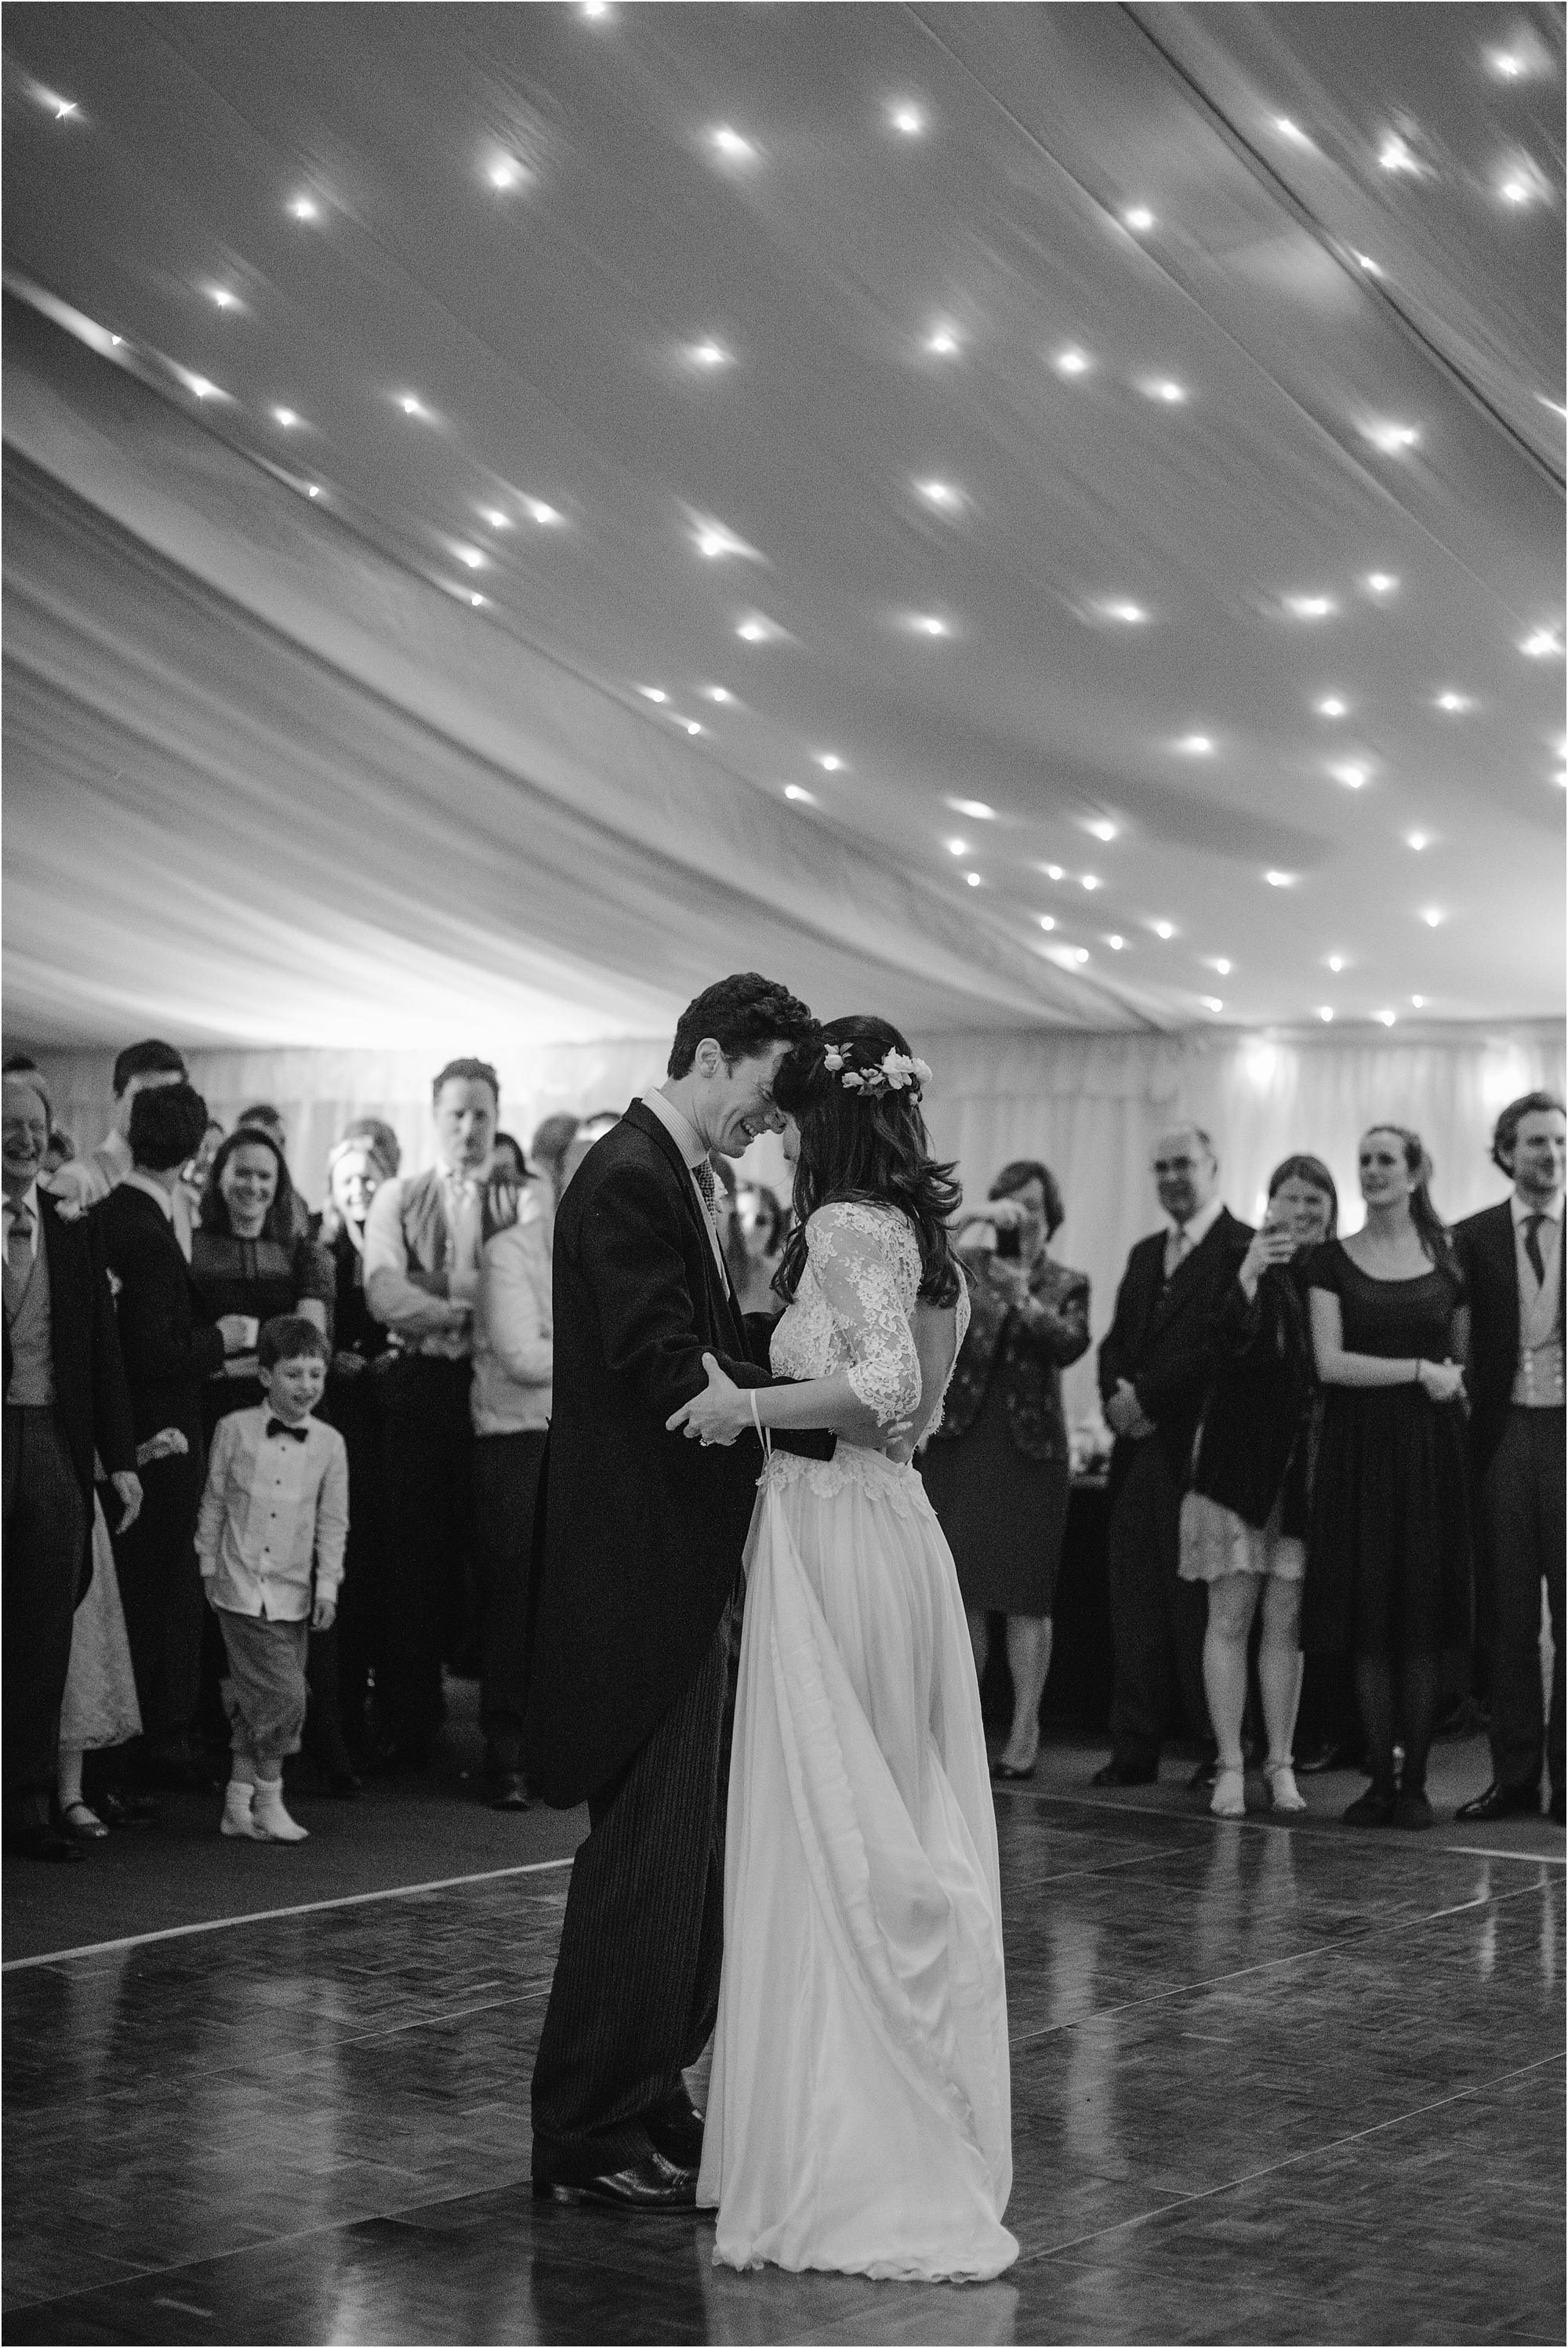 Rose+Harry-outdoor-english-wedding-photography__0114.jpg